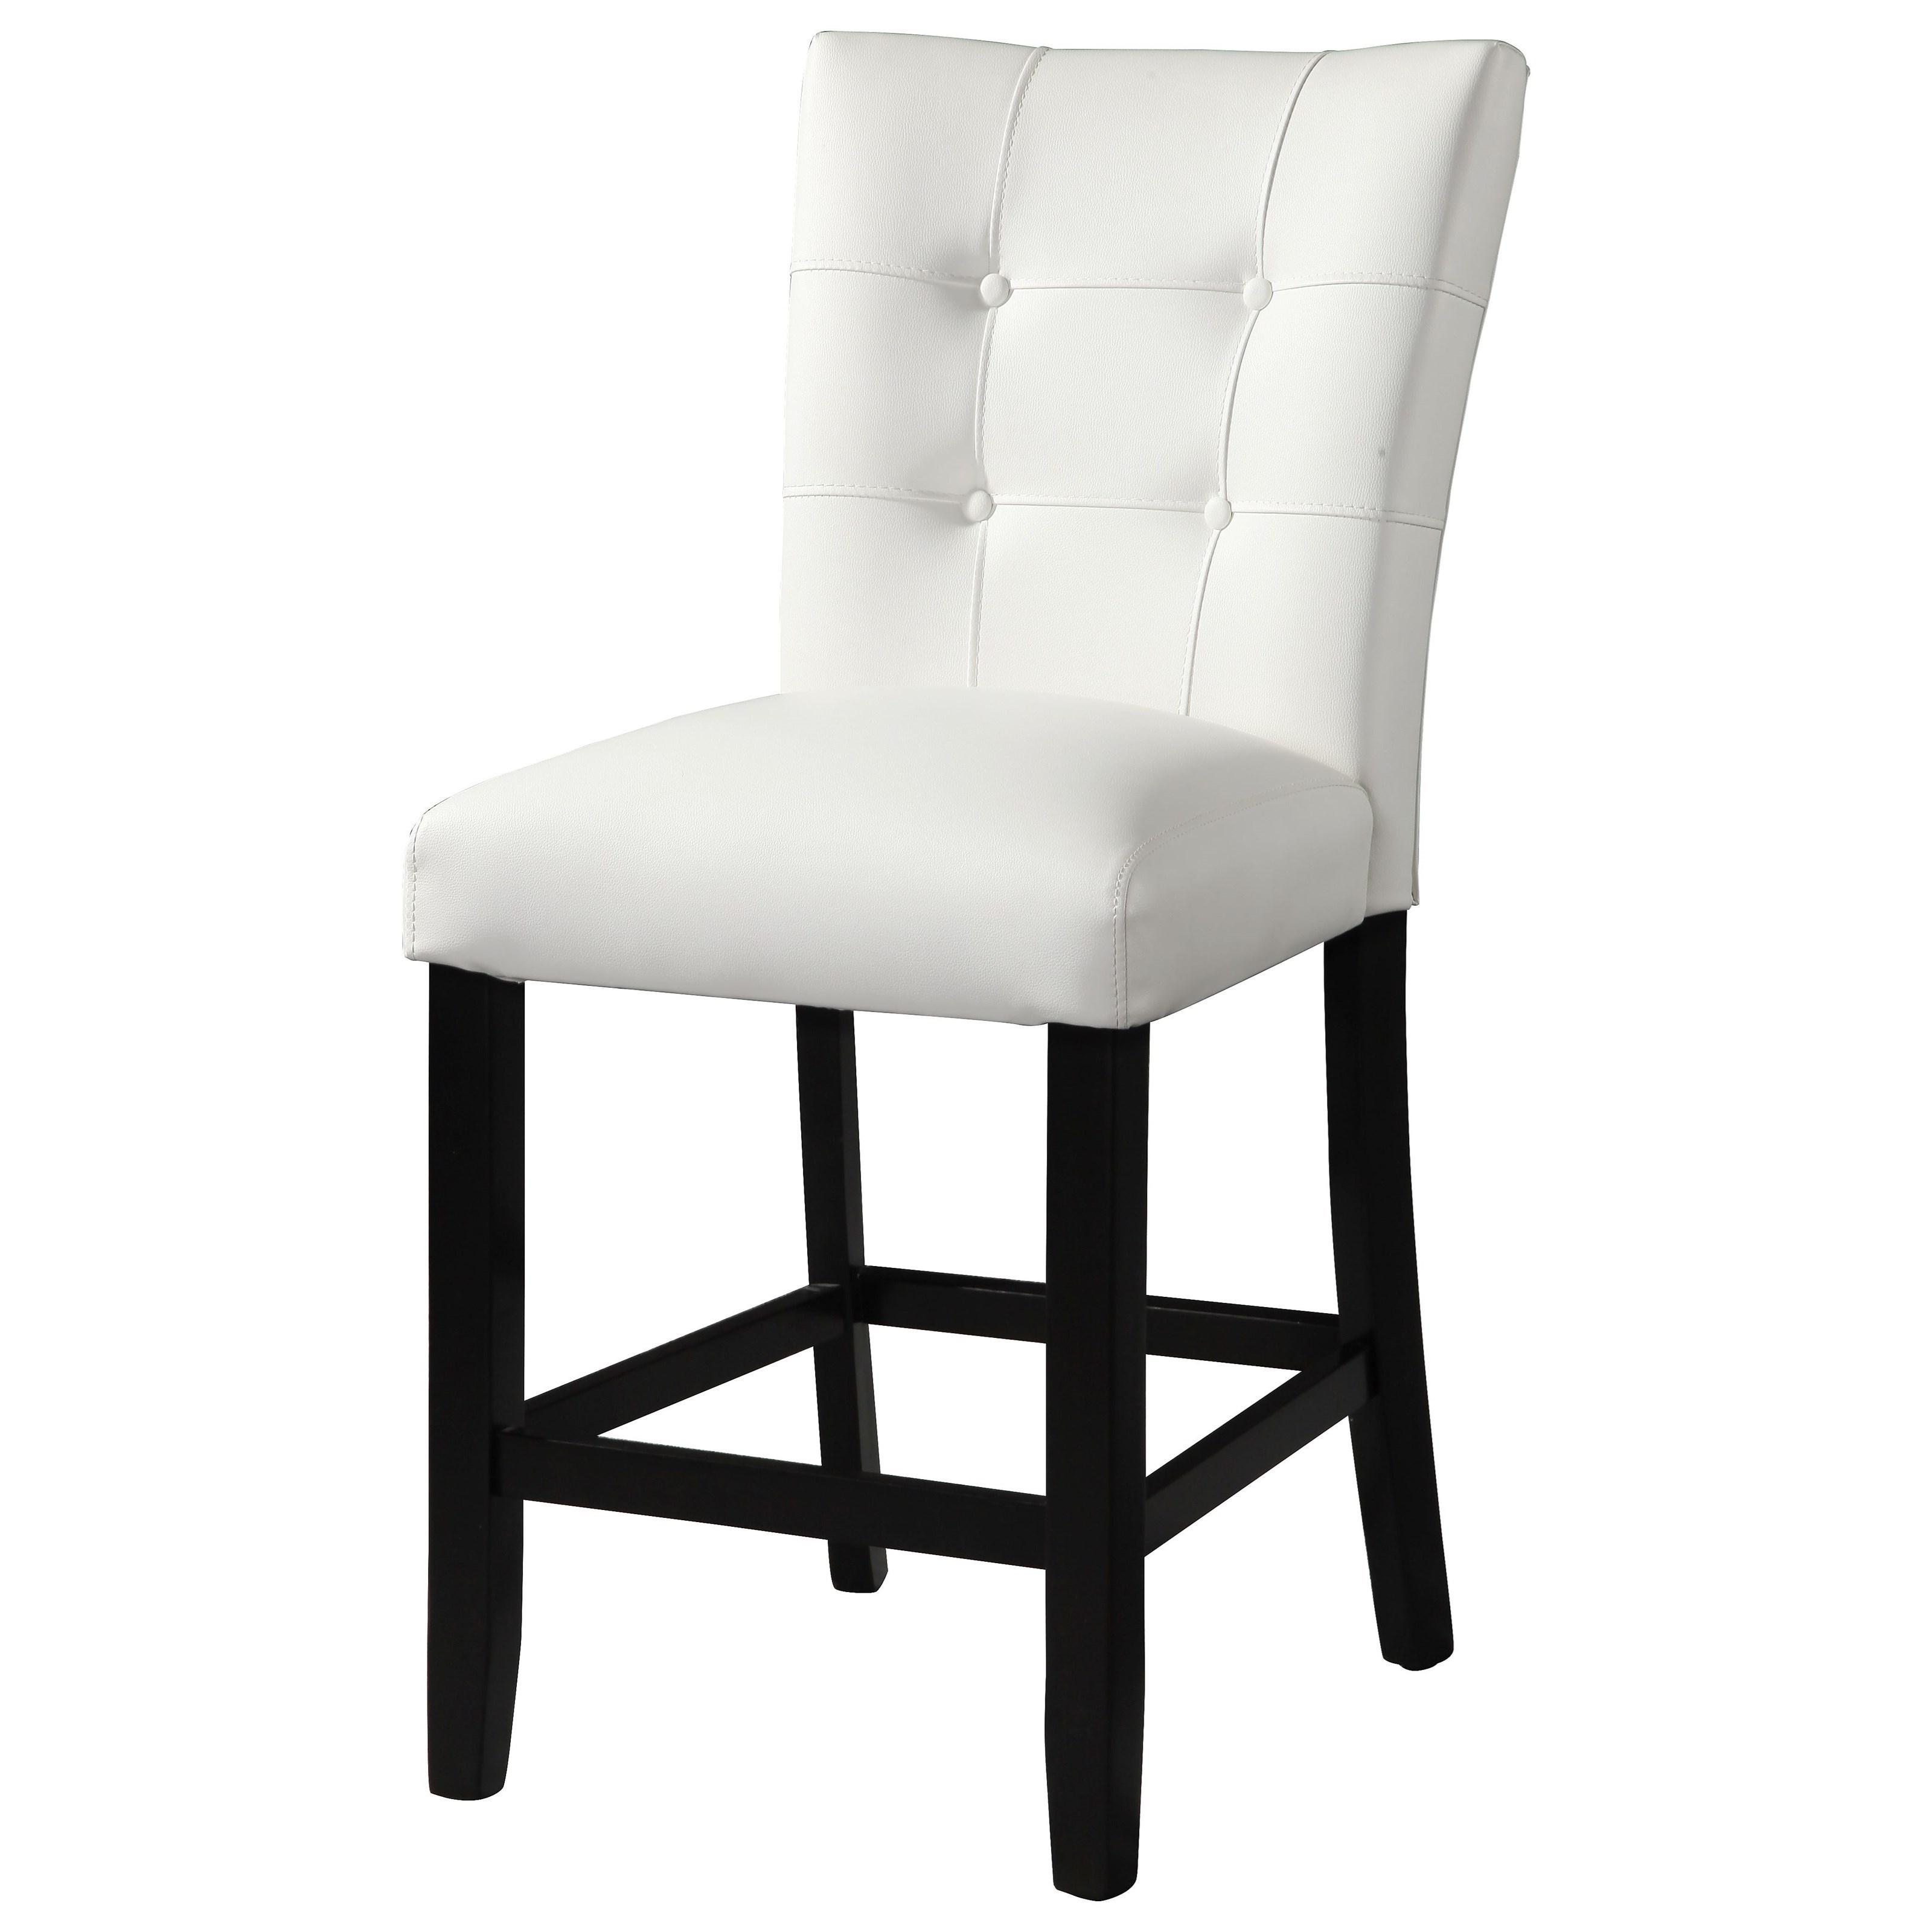 White Counter Chair